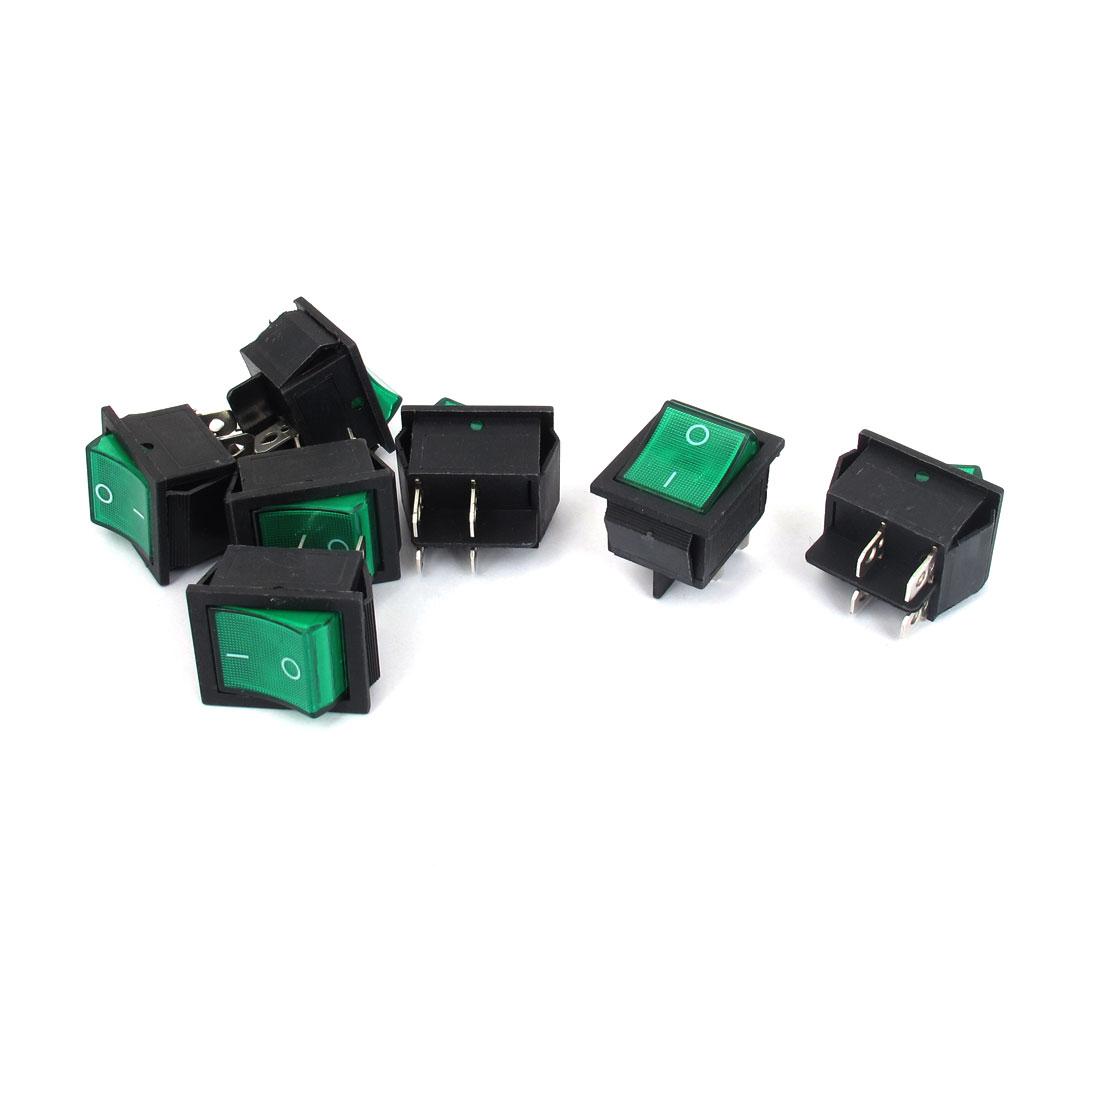 AC250V 16A/AC125V 20A Green Light Square DPST Rocker Toggle Switch 7pcs